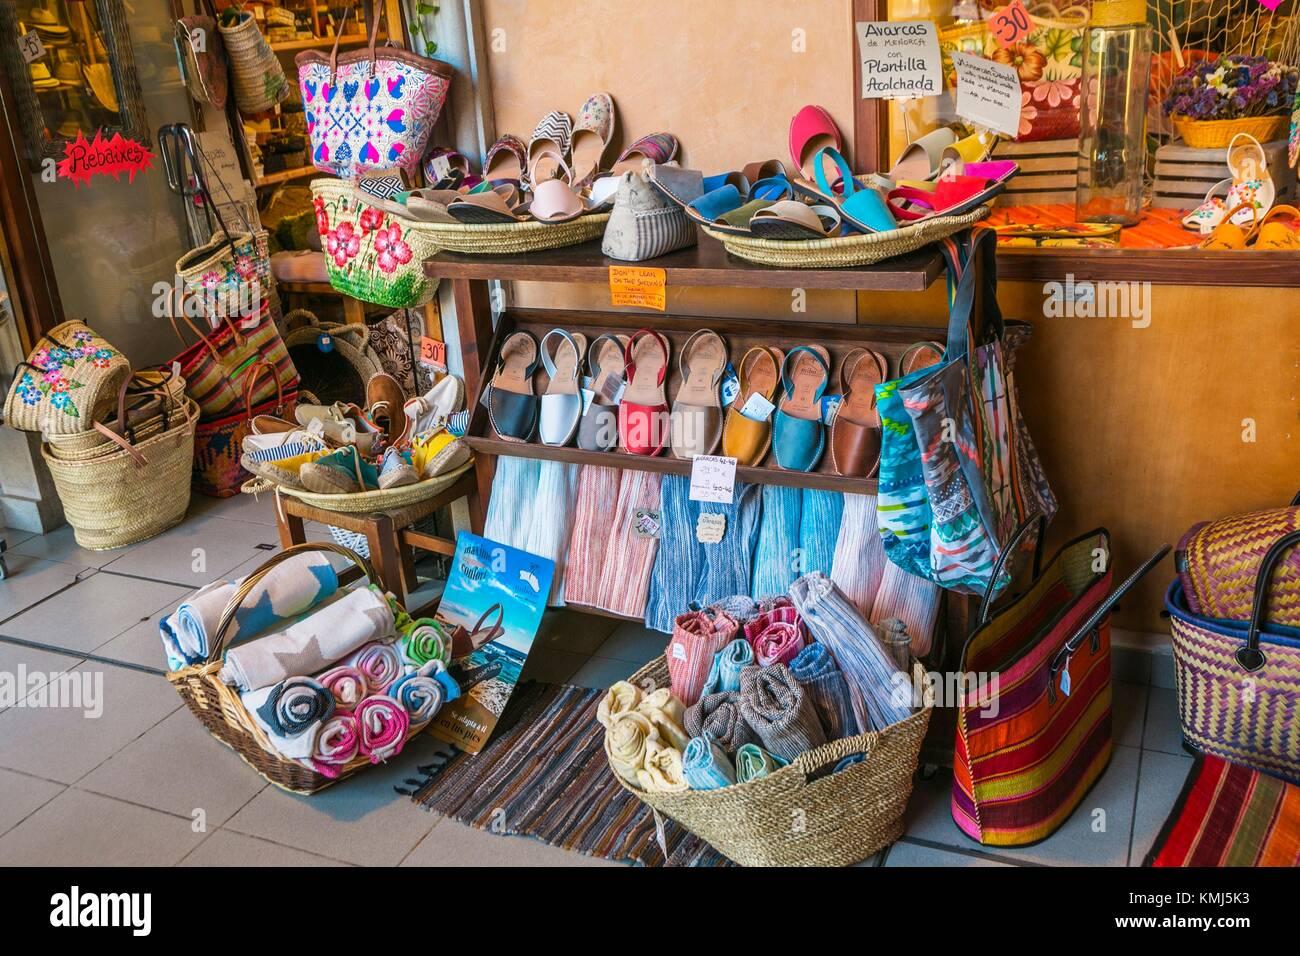 Cloister of Carmen Market. Maó City. Maó Municipality. Menorca Island. Balearic Islands. Spain - Stock Image